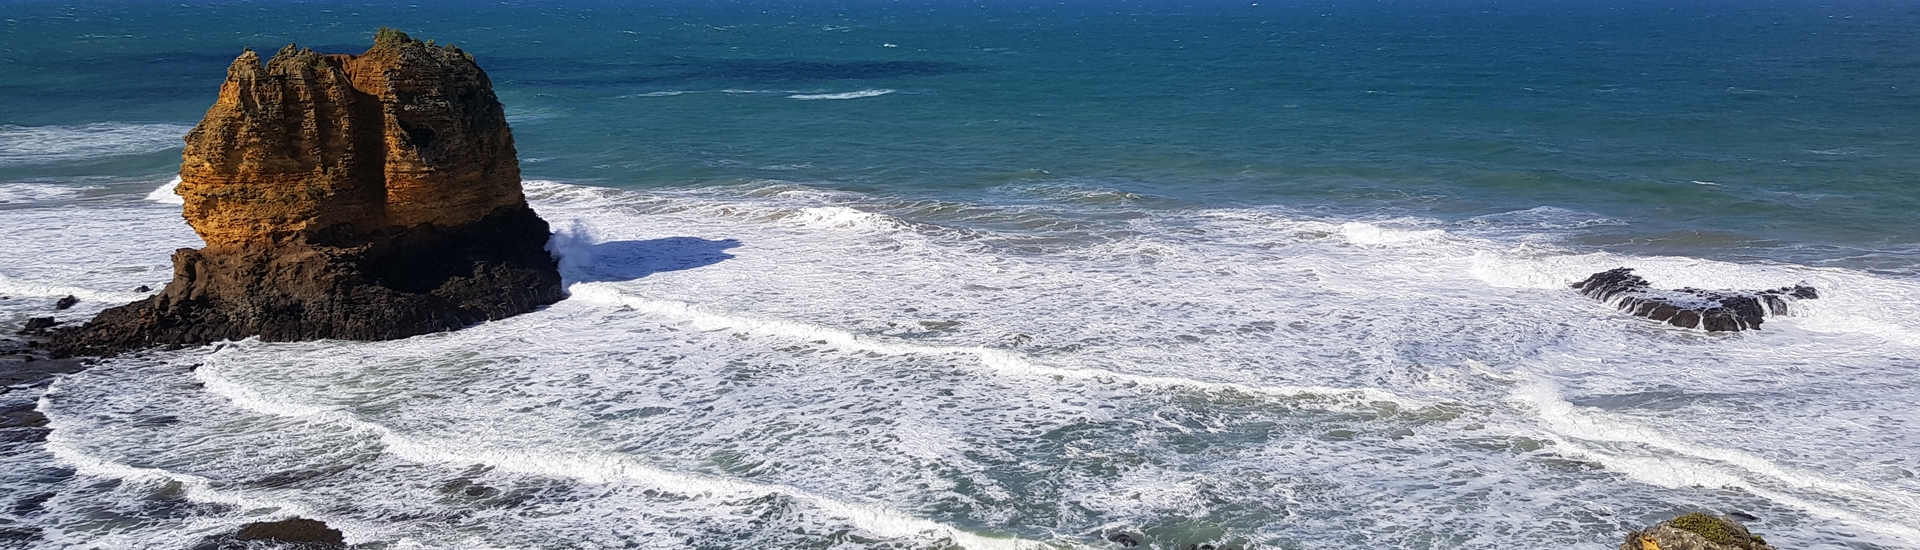 Slider-Image-Ocean